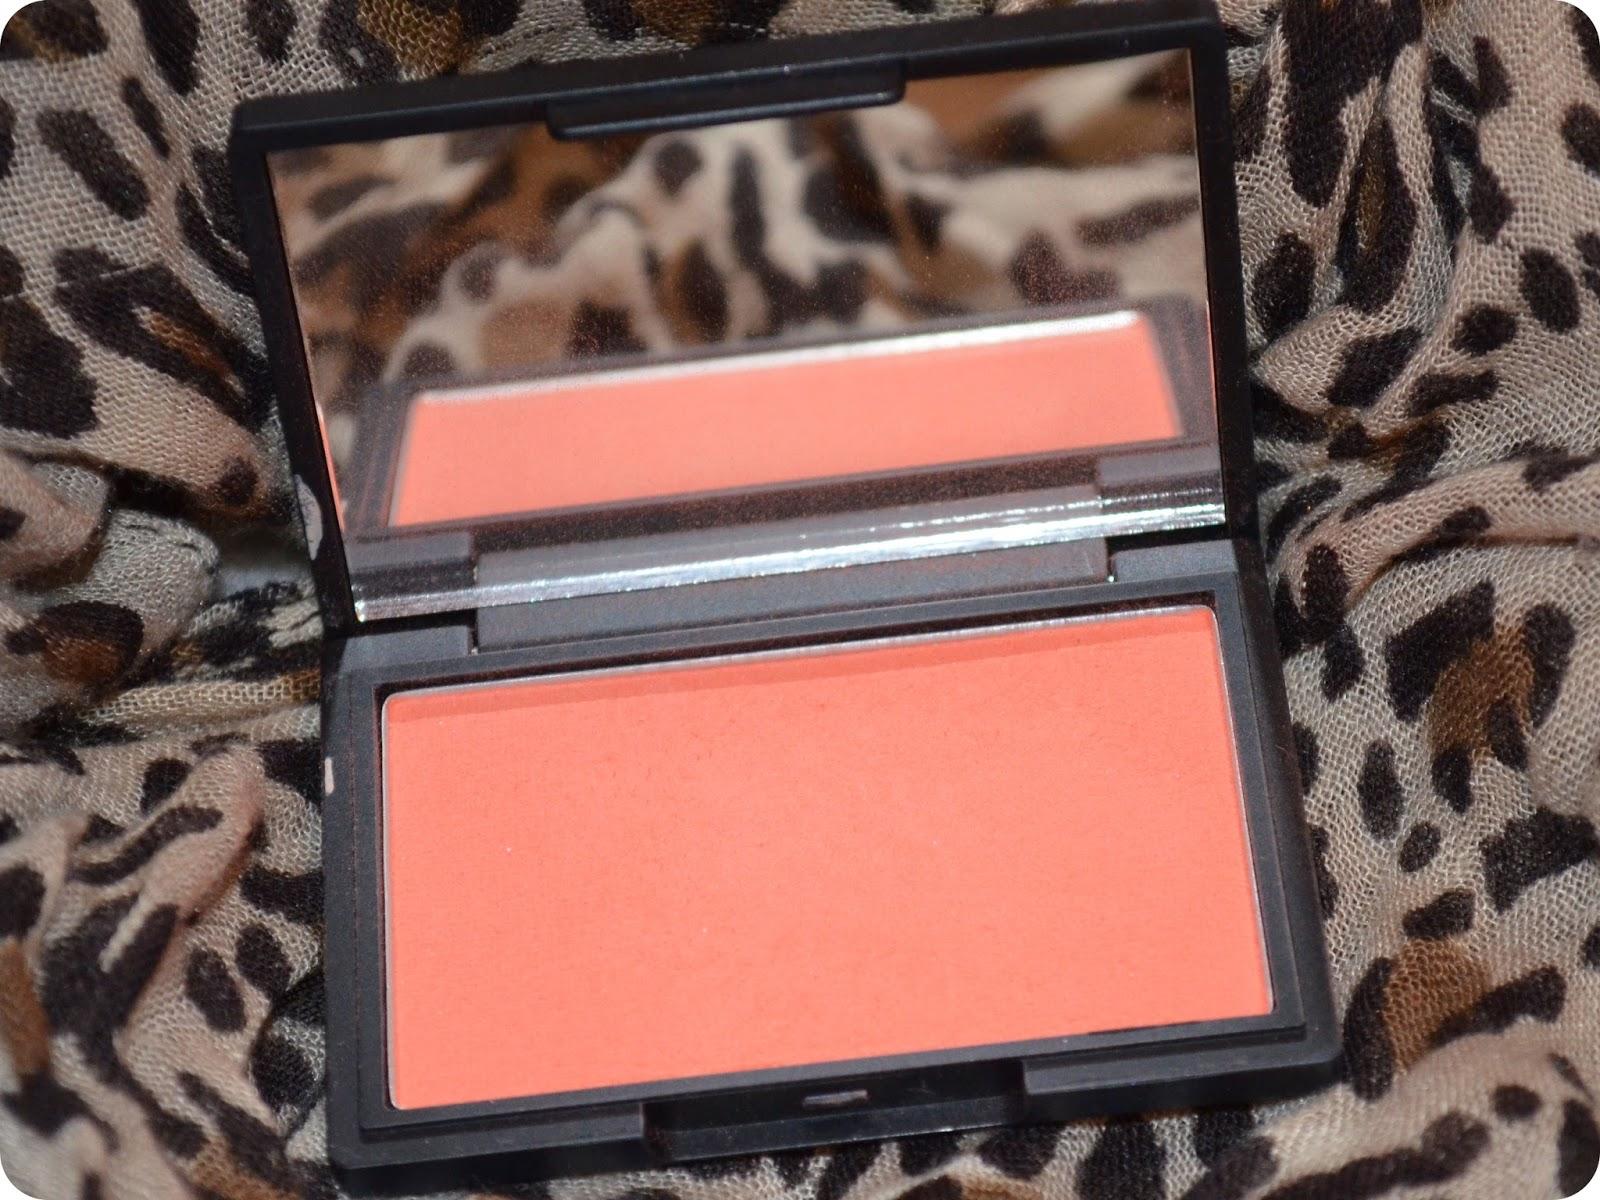 Recenze/Review: Sleek Blush - Life's a Peach